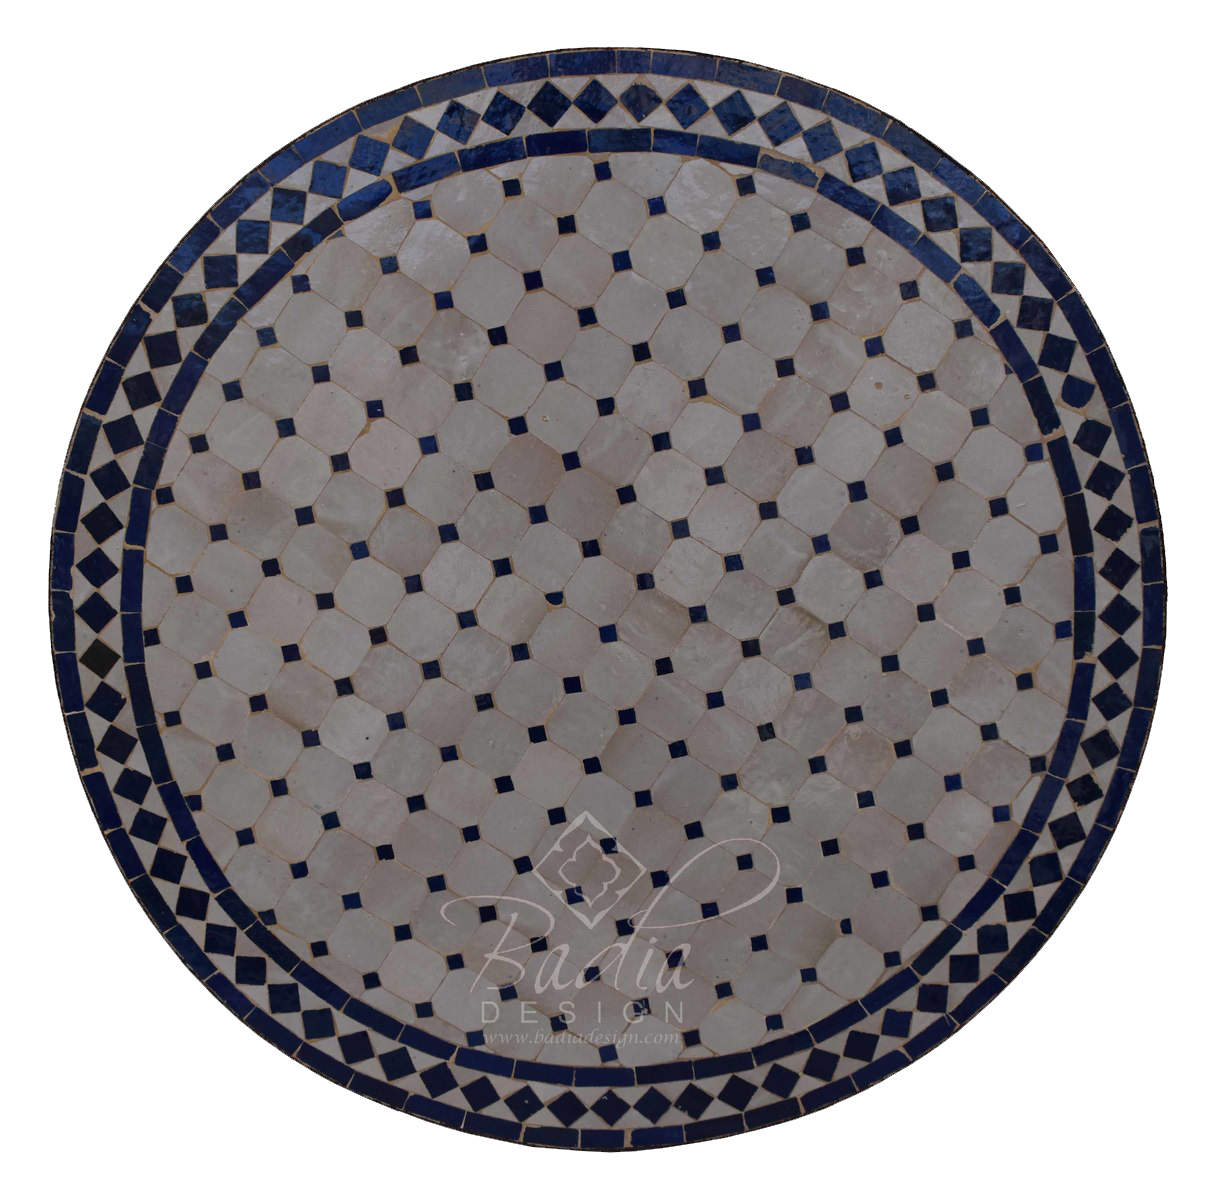 moroccan-ceramic-tile-table-top-mtr281.jpg